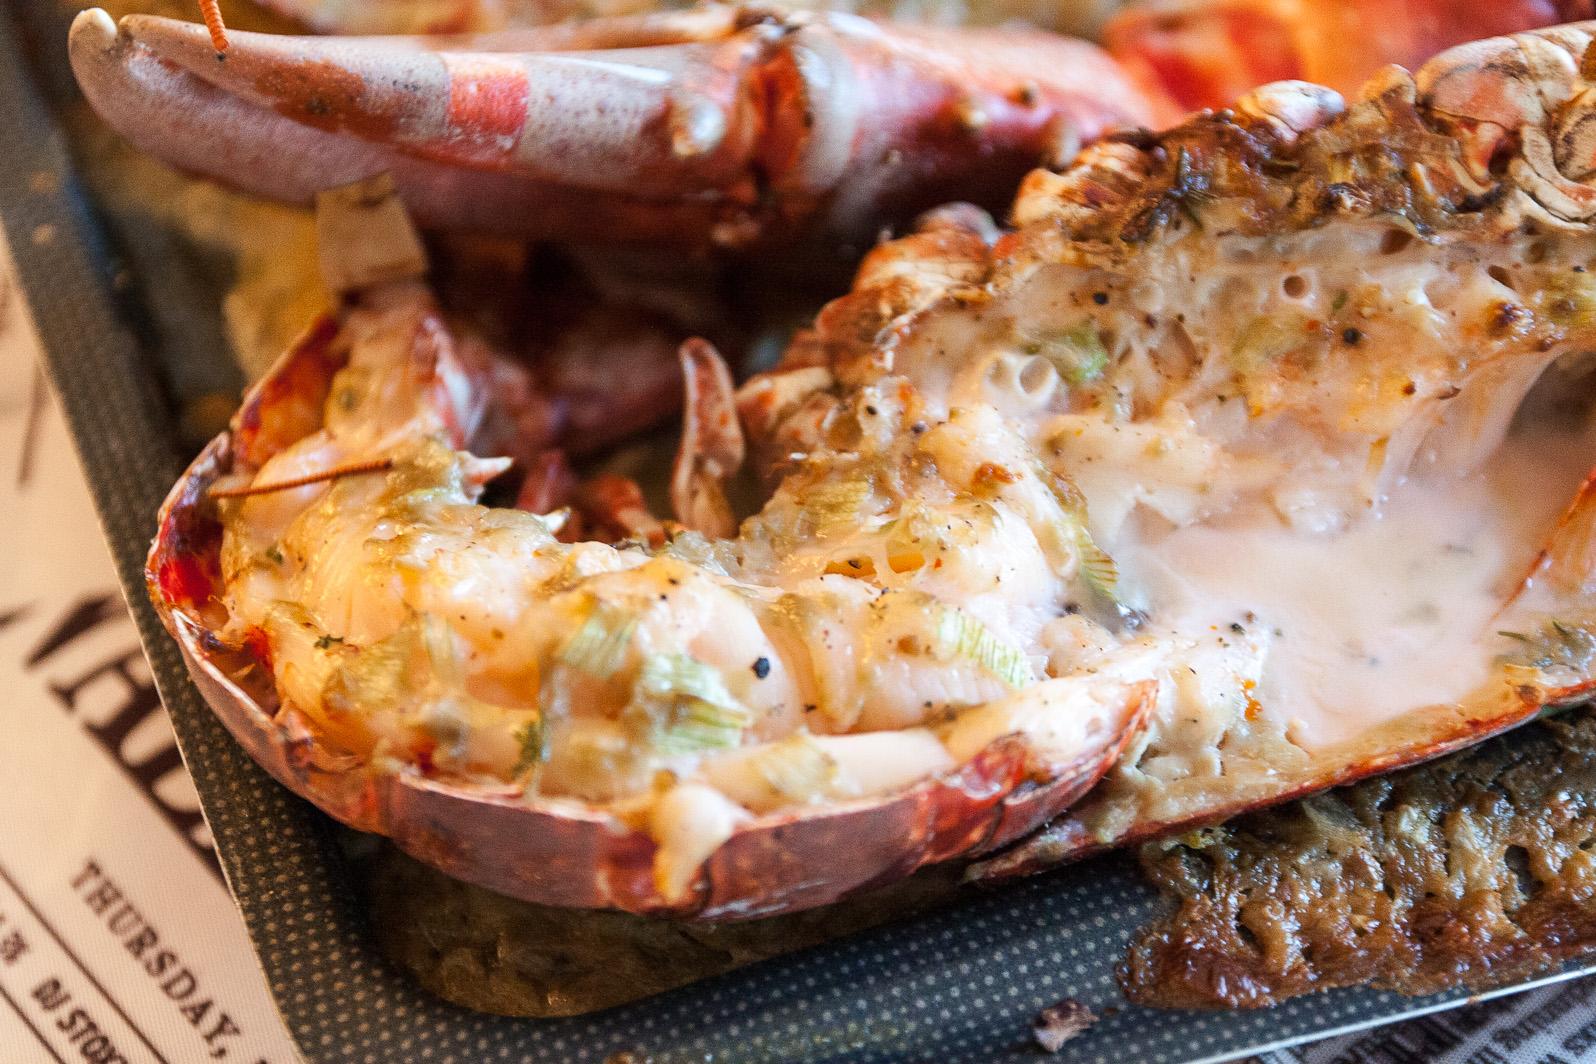 Agencer et mijoter homard grill la camaretoise - Recette homard grille ...